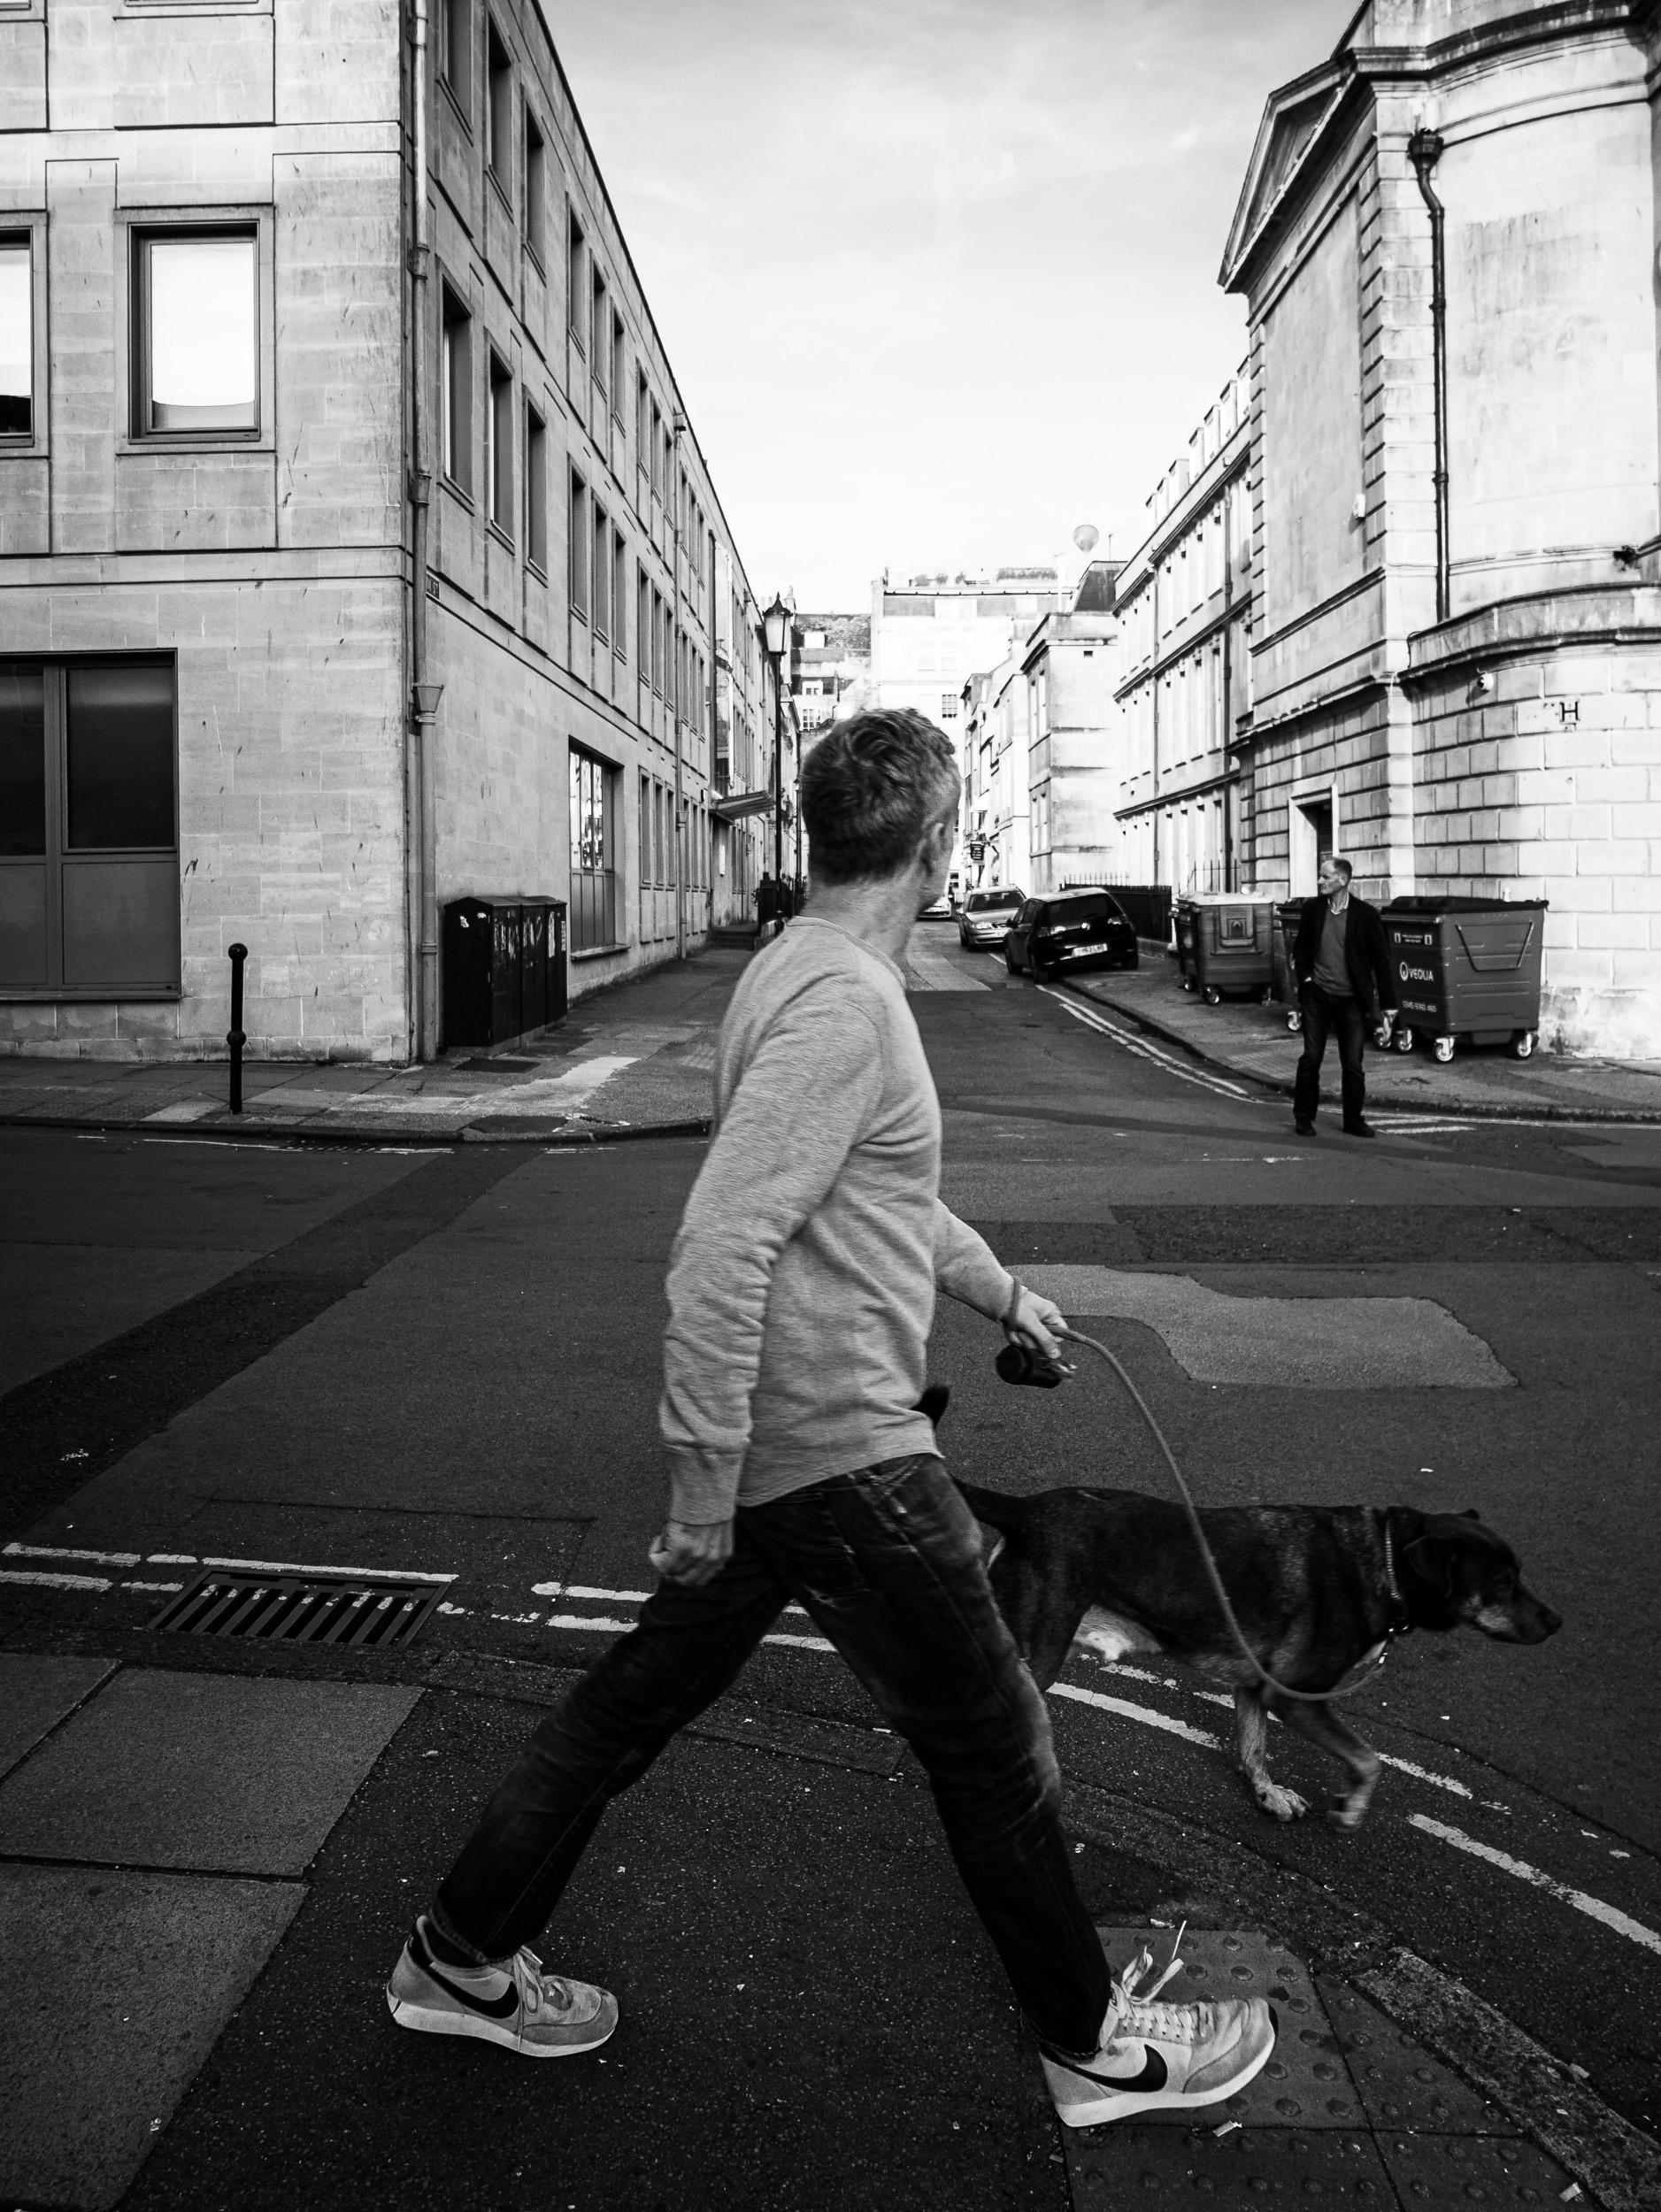 20190908-Streets of Bath #5.jpg